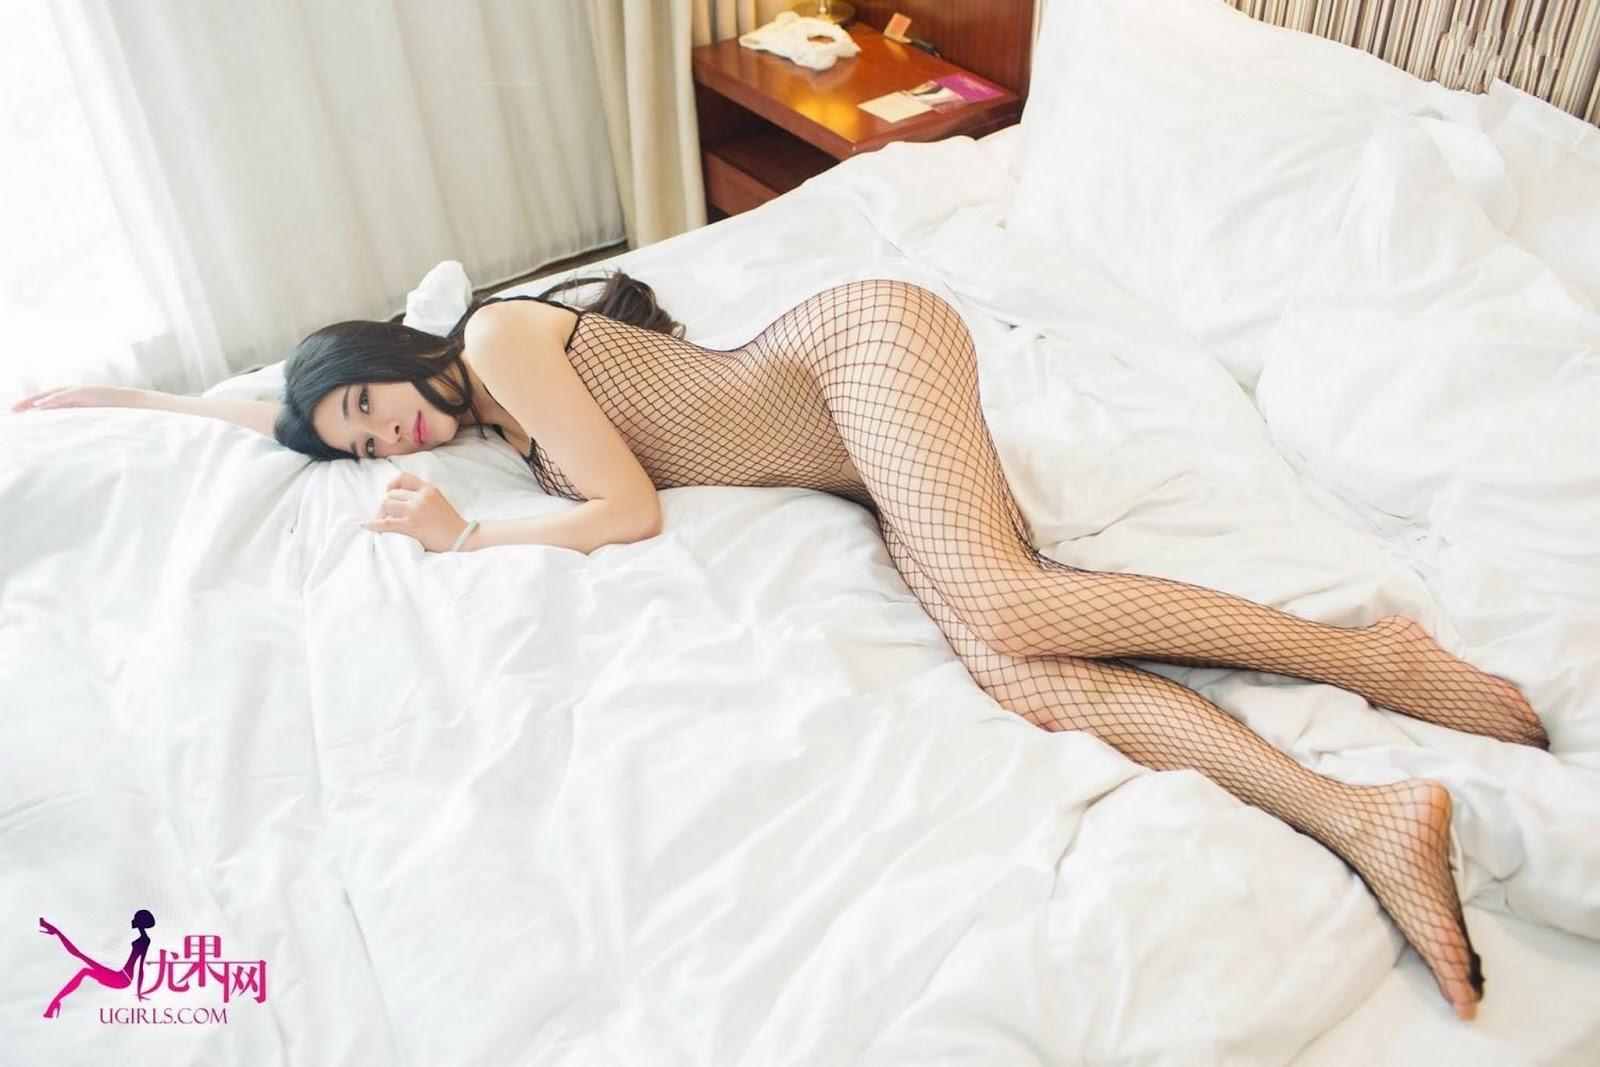 22 - Sexy Photo UGIRLS NO.103 Nude Girl